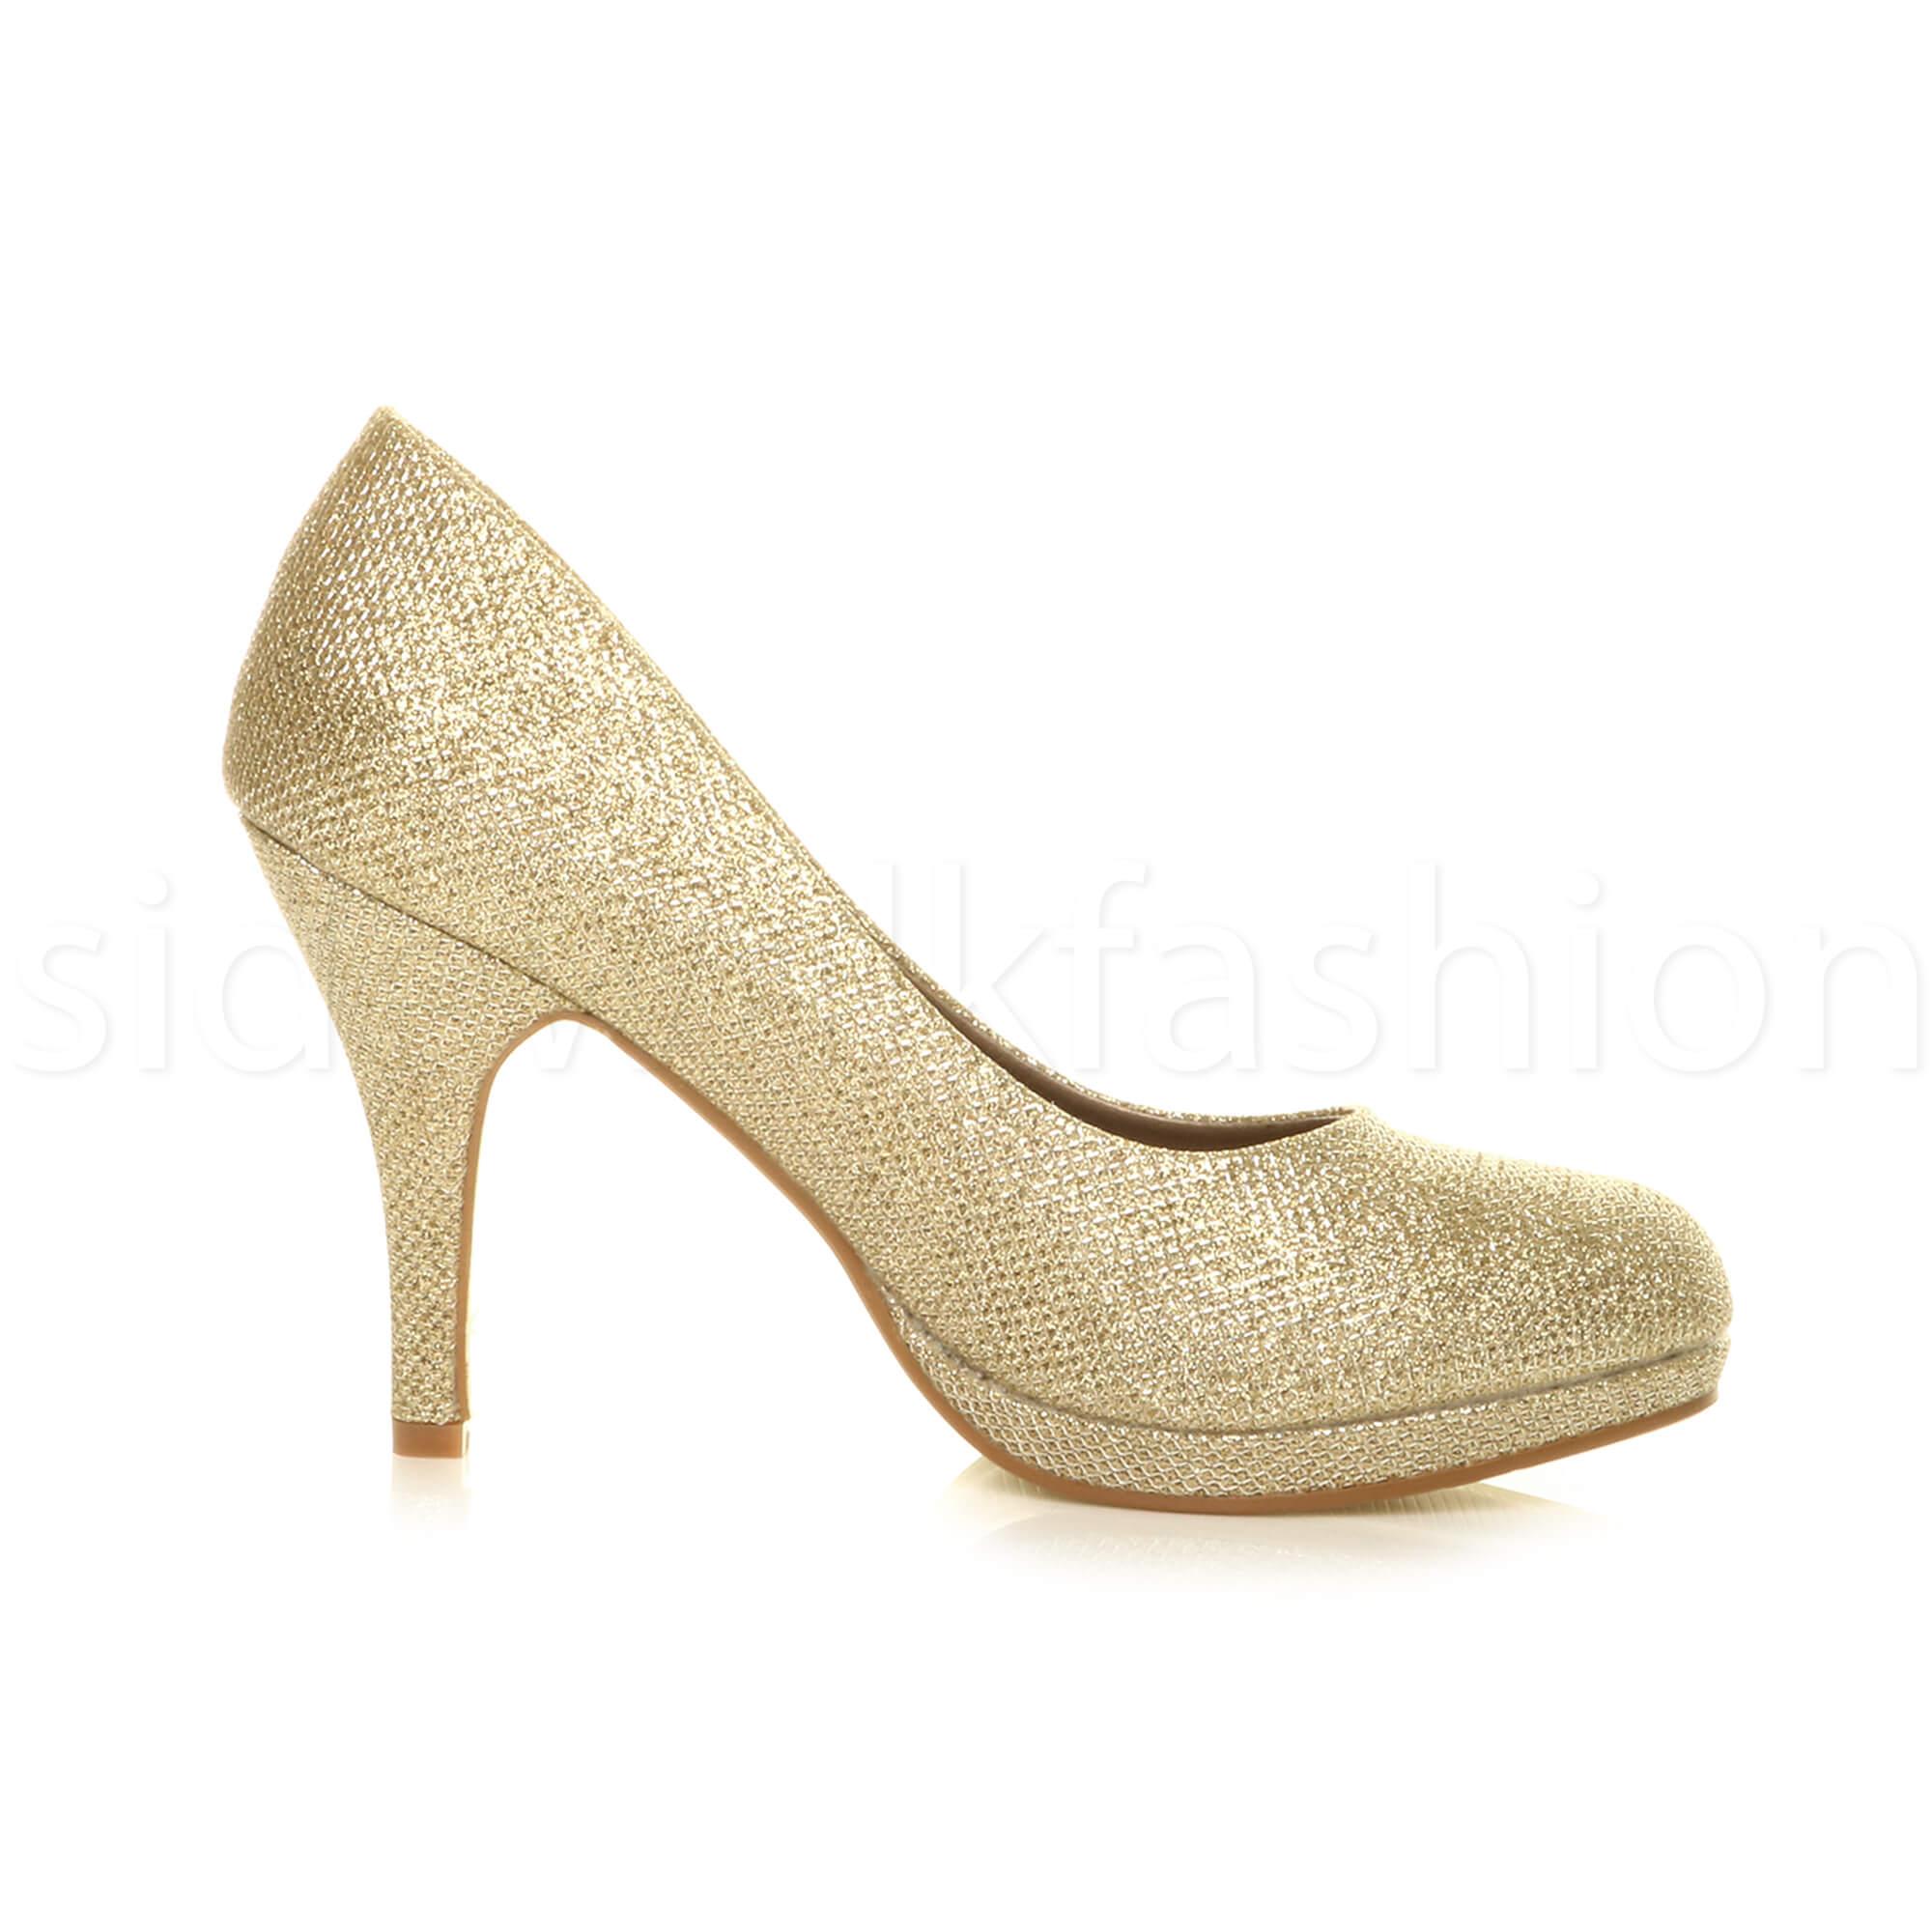 Womens-ladies-high-mid-heel-platform-wedding-evening-bridesmaid-court-shoes-size thumbnail 67